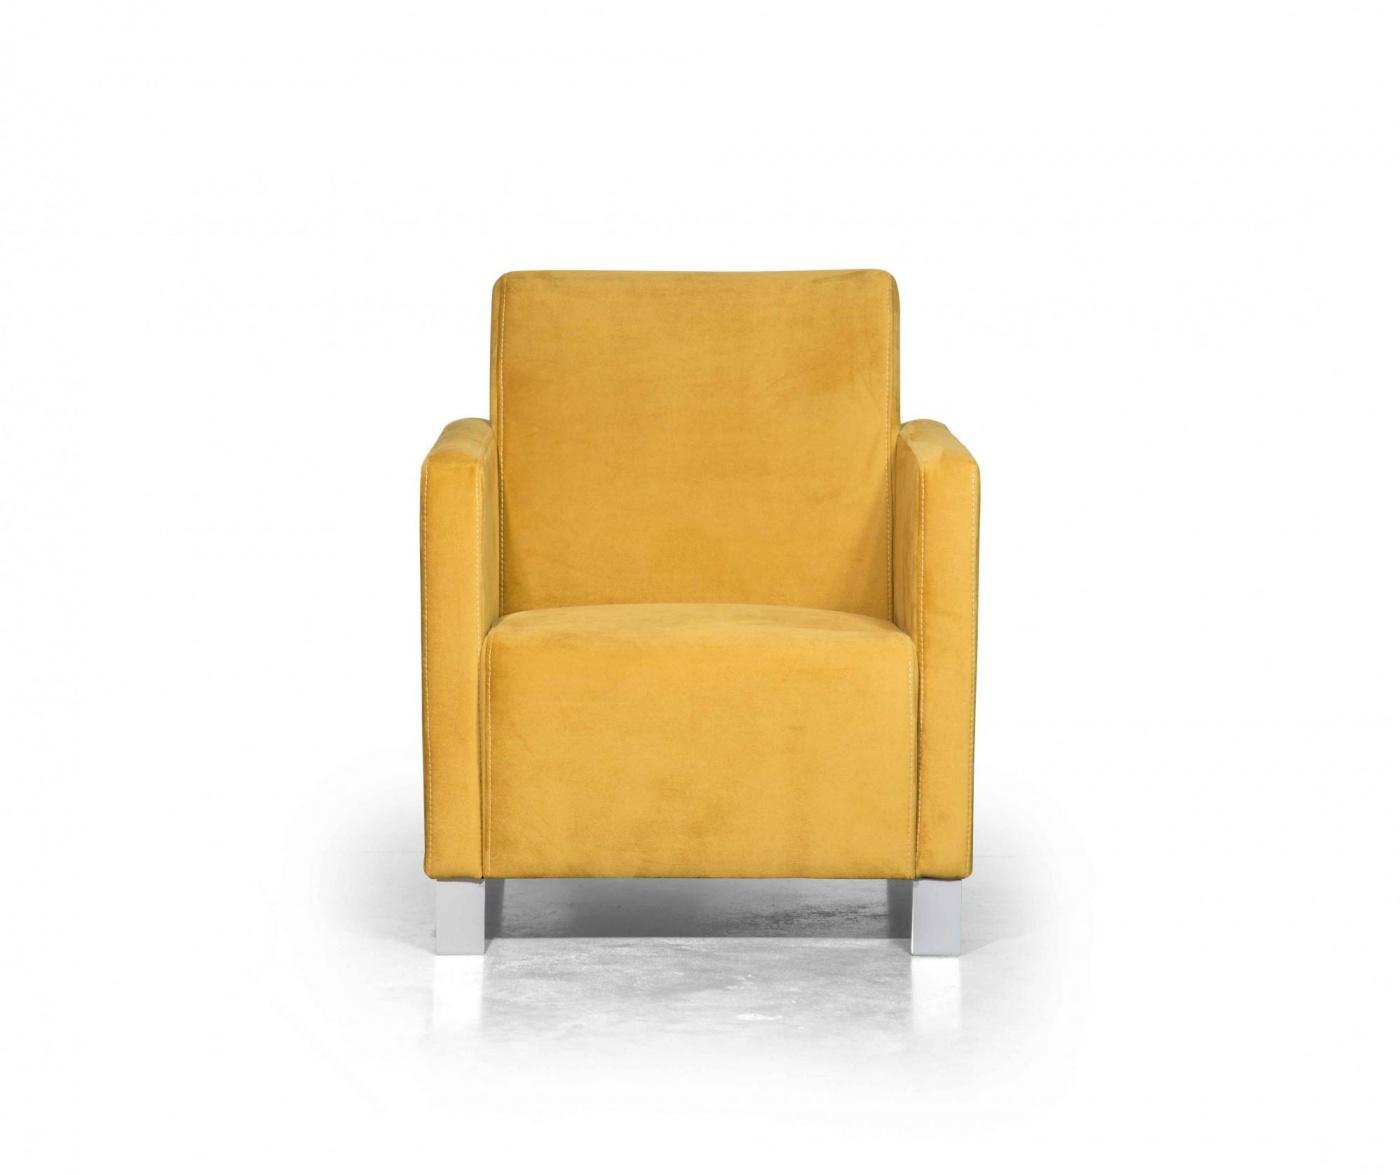 Fotelja Miami Mustard